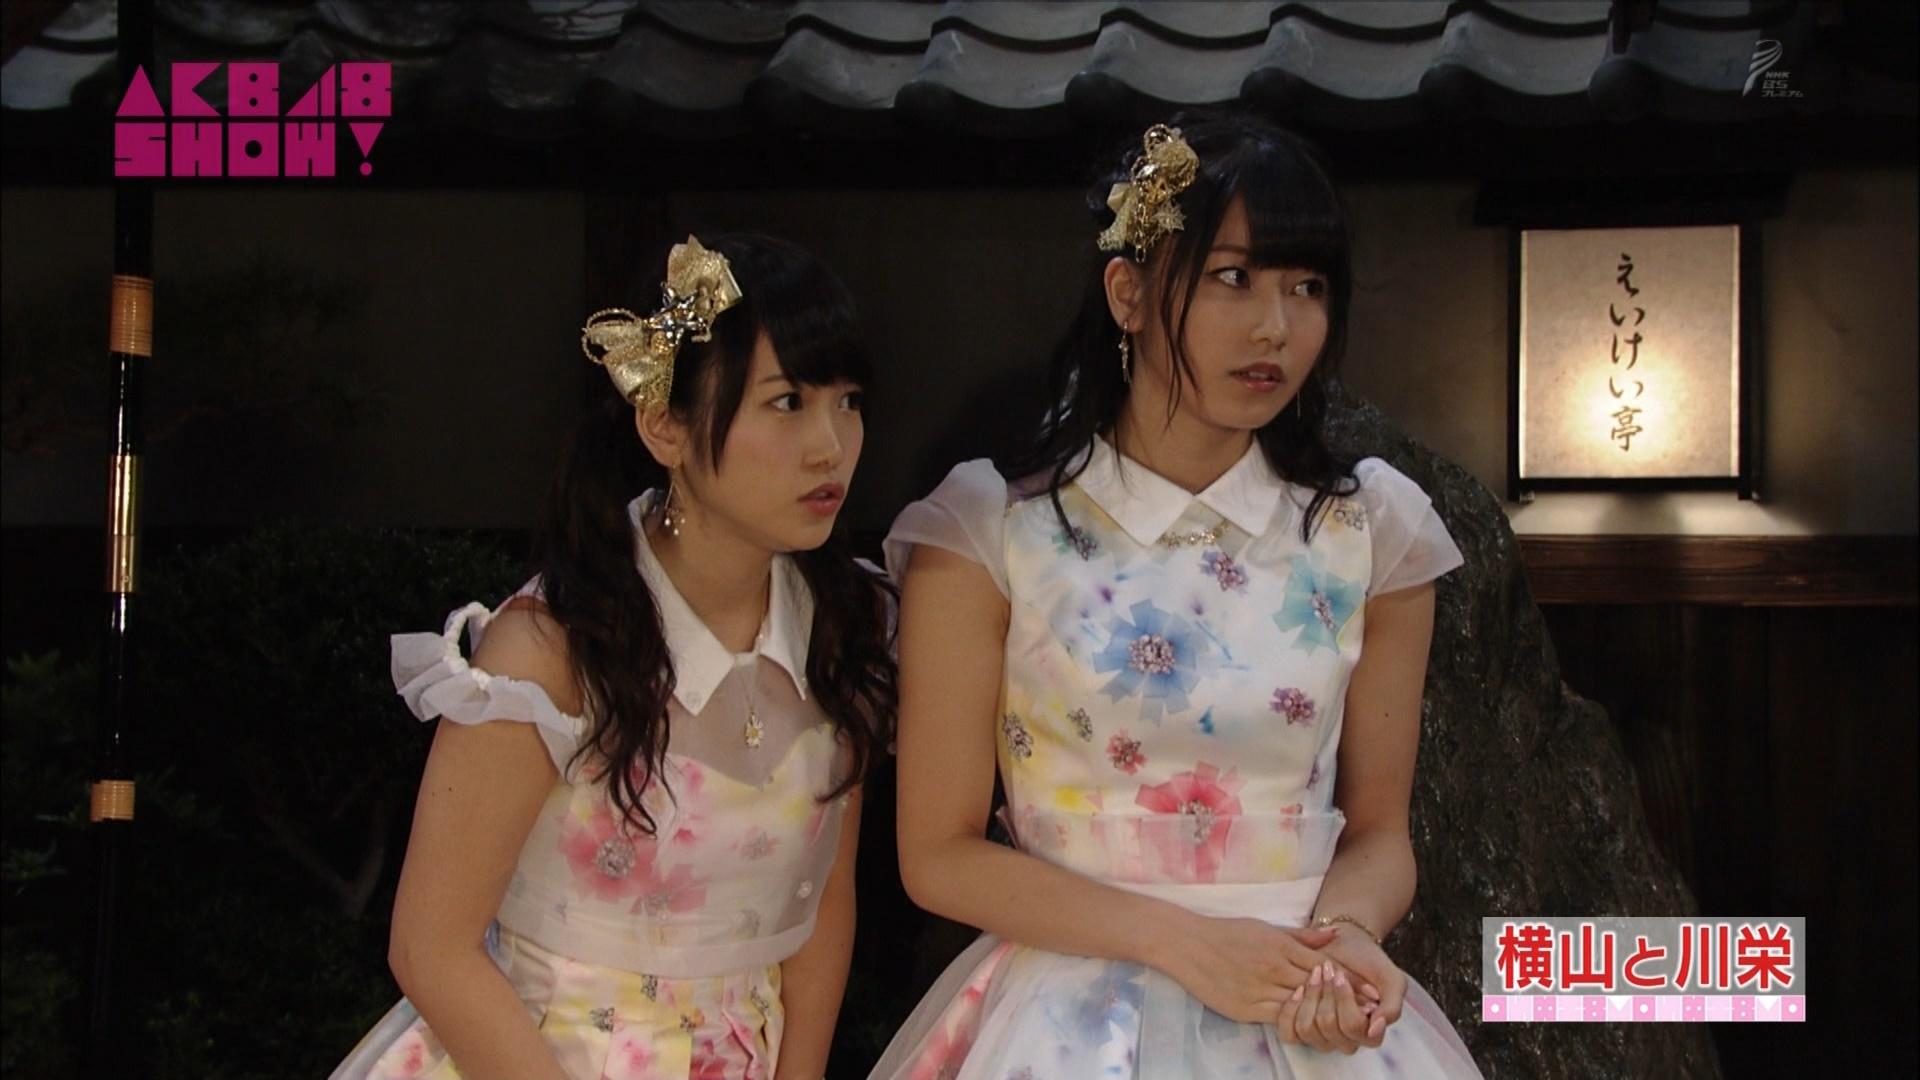 横山由依と川栄李奈 AKB48SHOW! 20140906 (8)